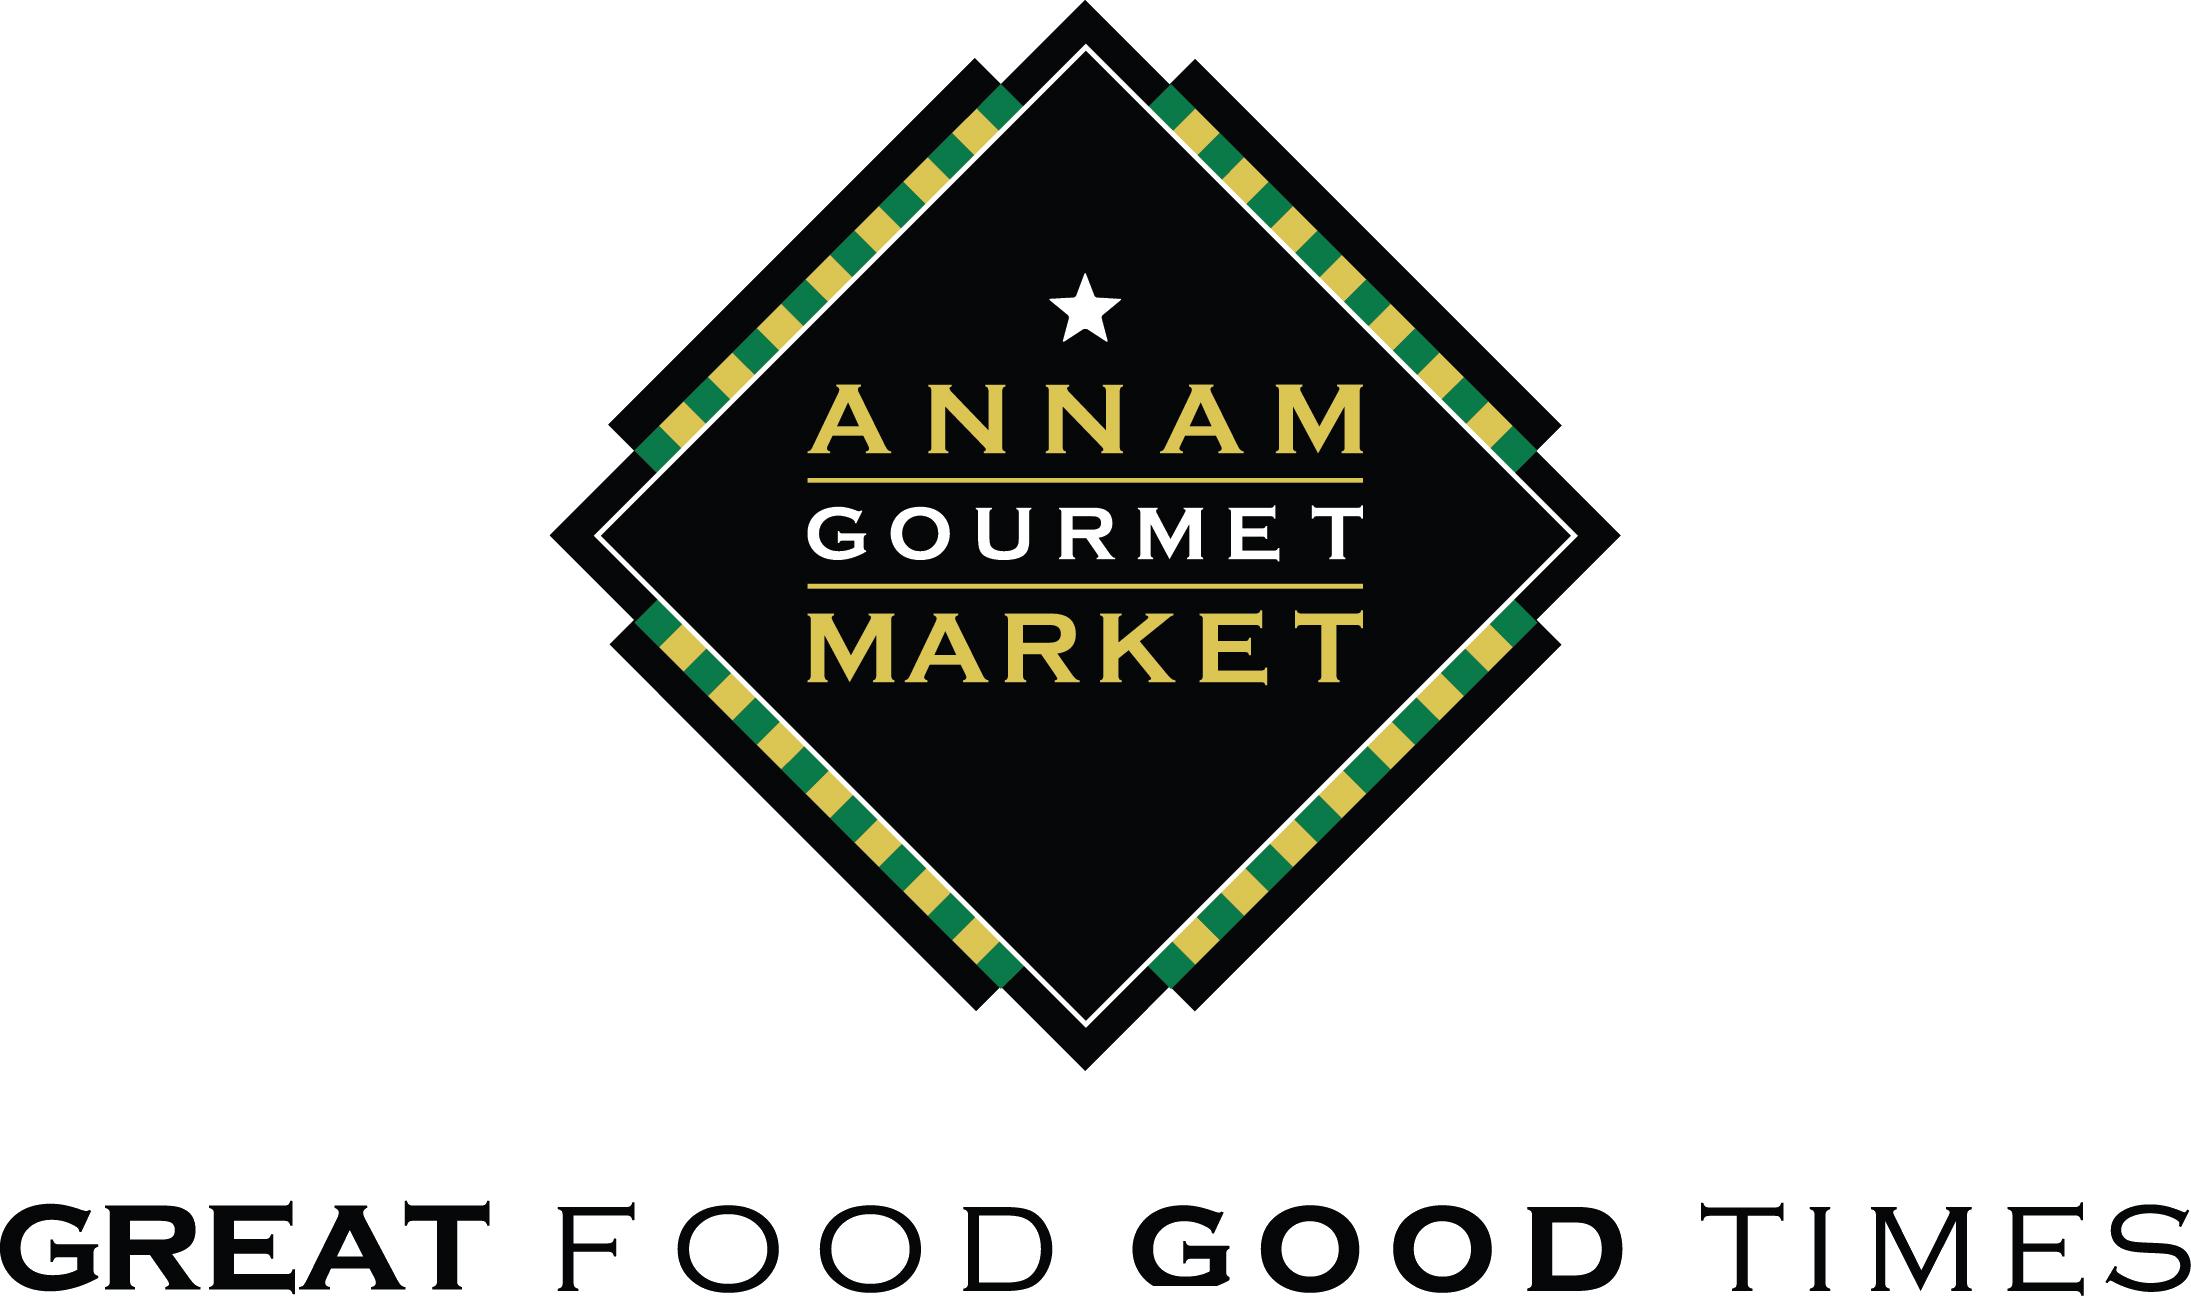 Annam Gourmet Market logo